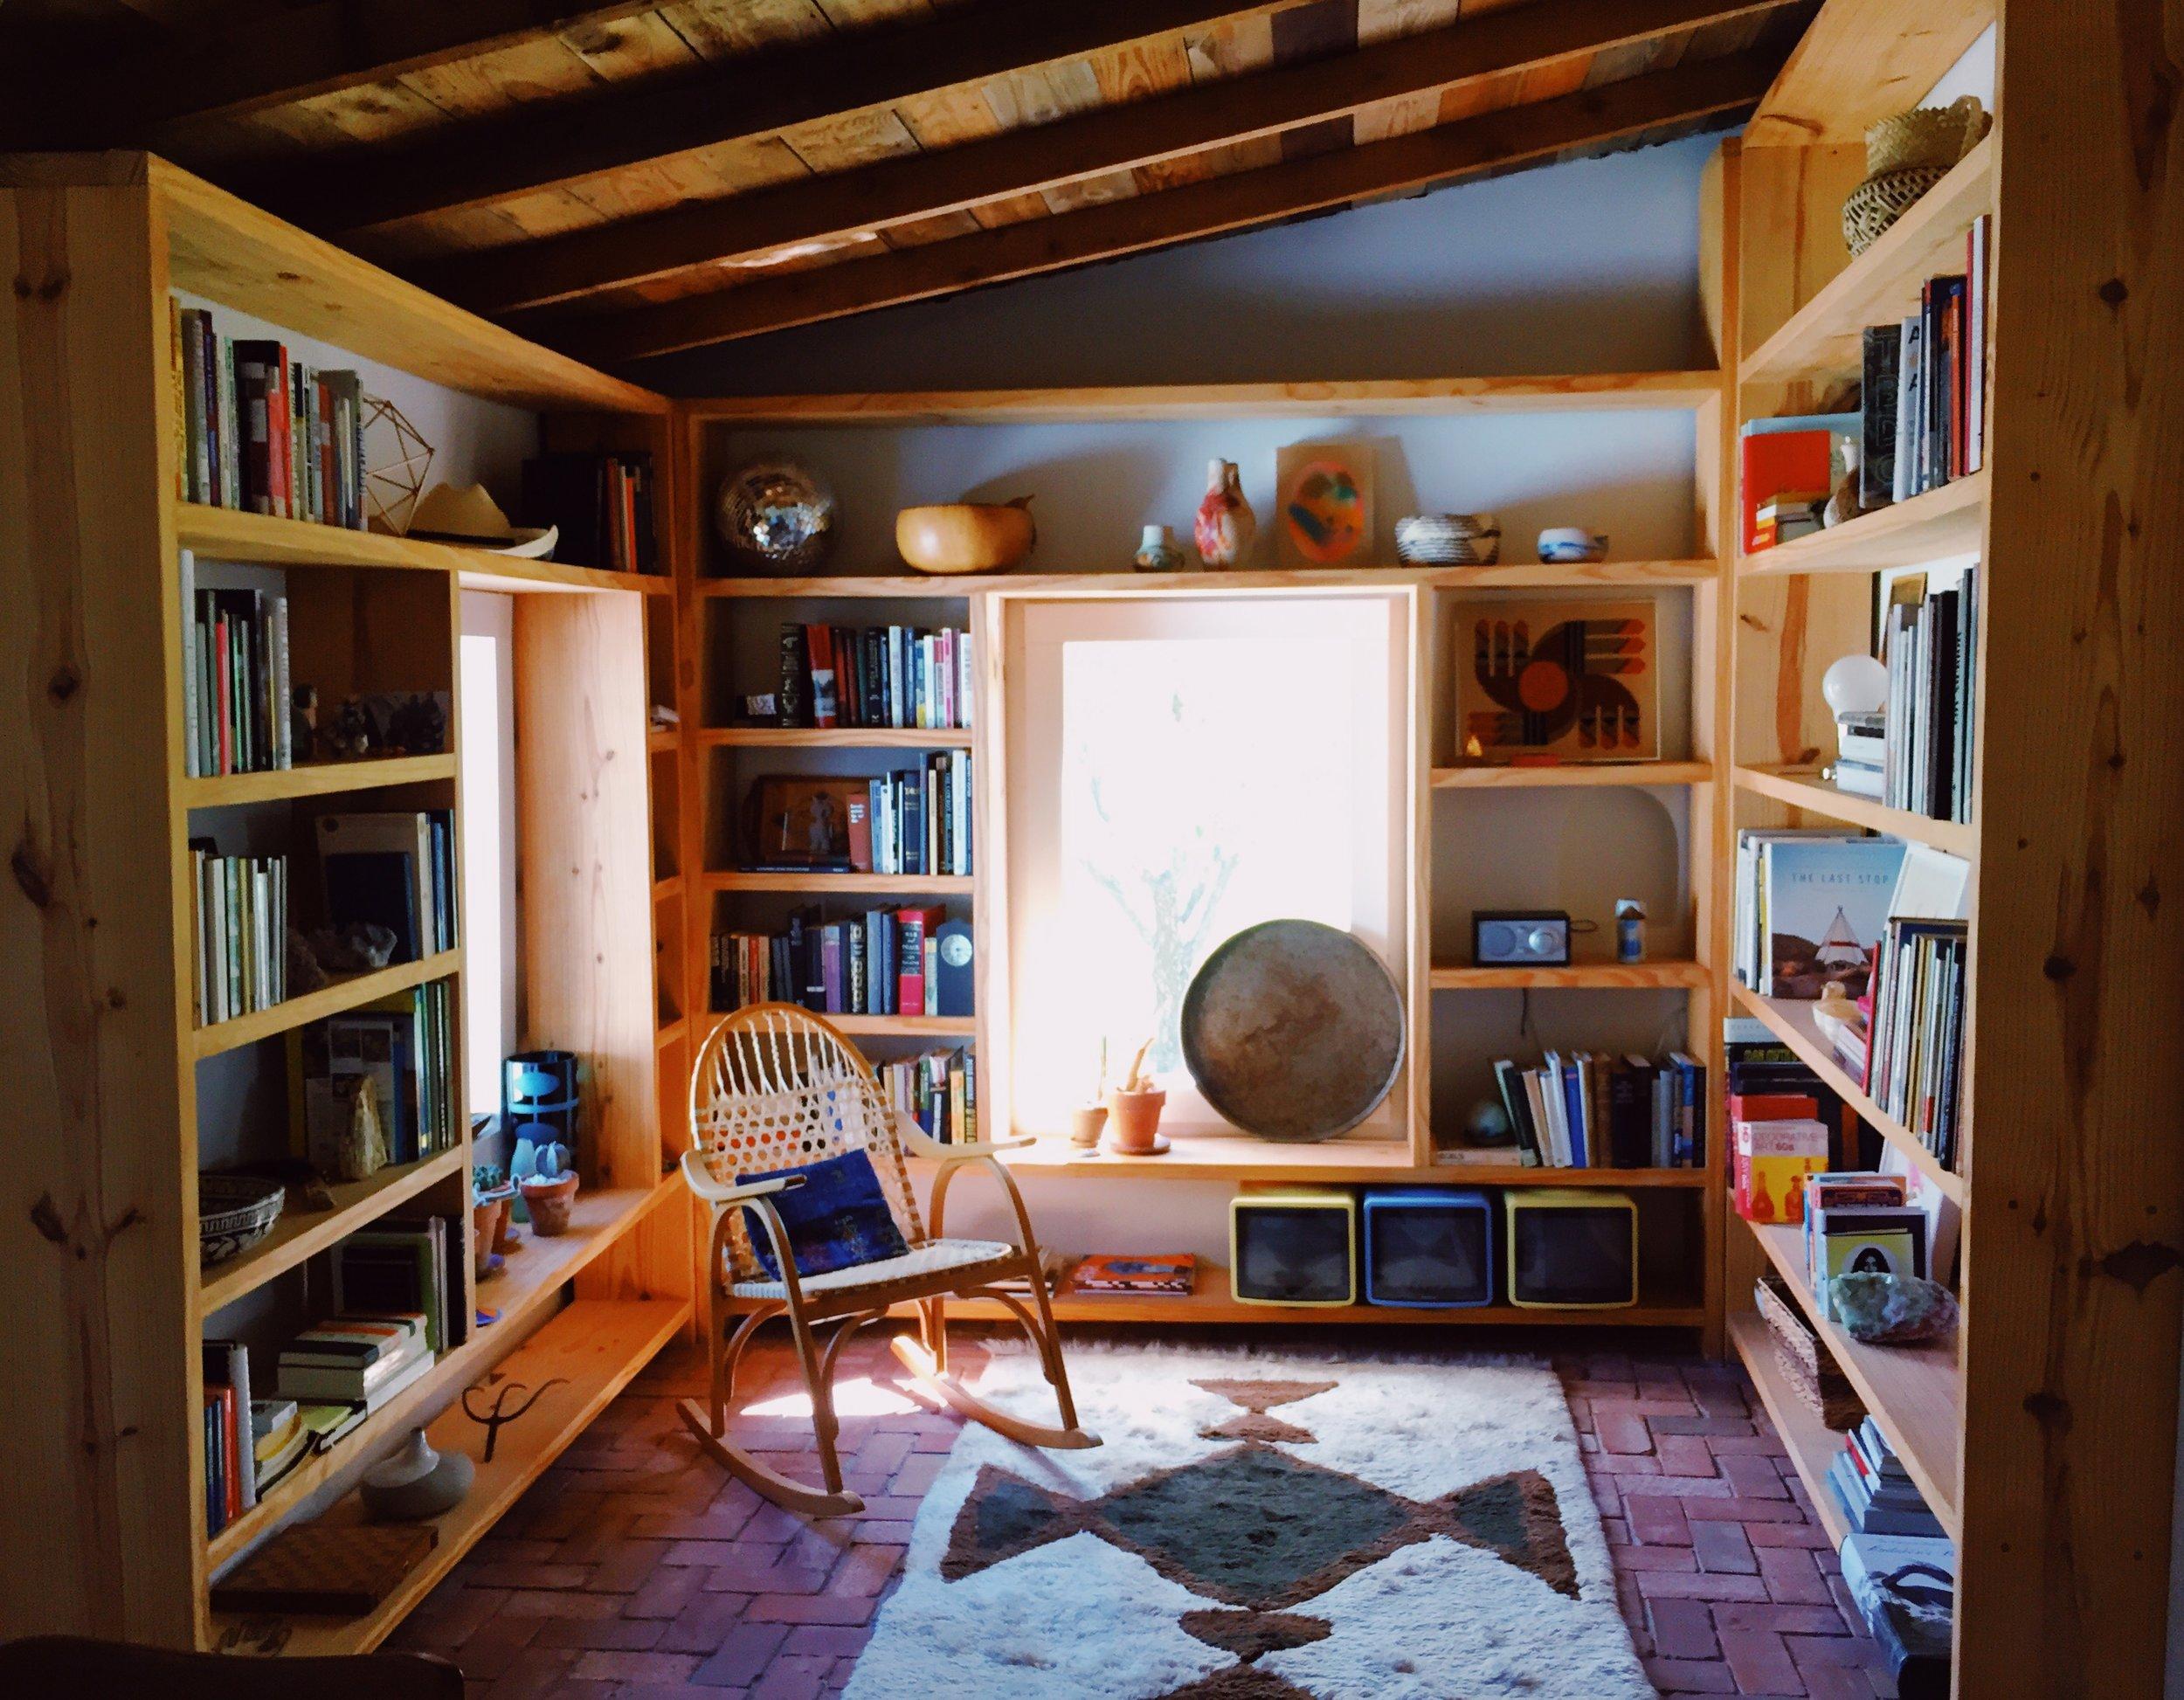 The extra fabulous library. Photo by Jodee Molina.